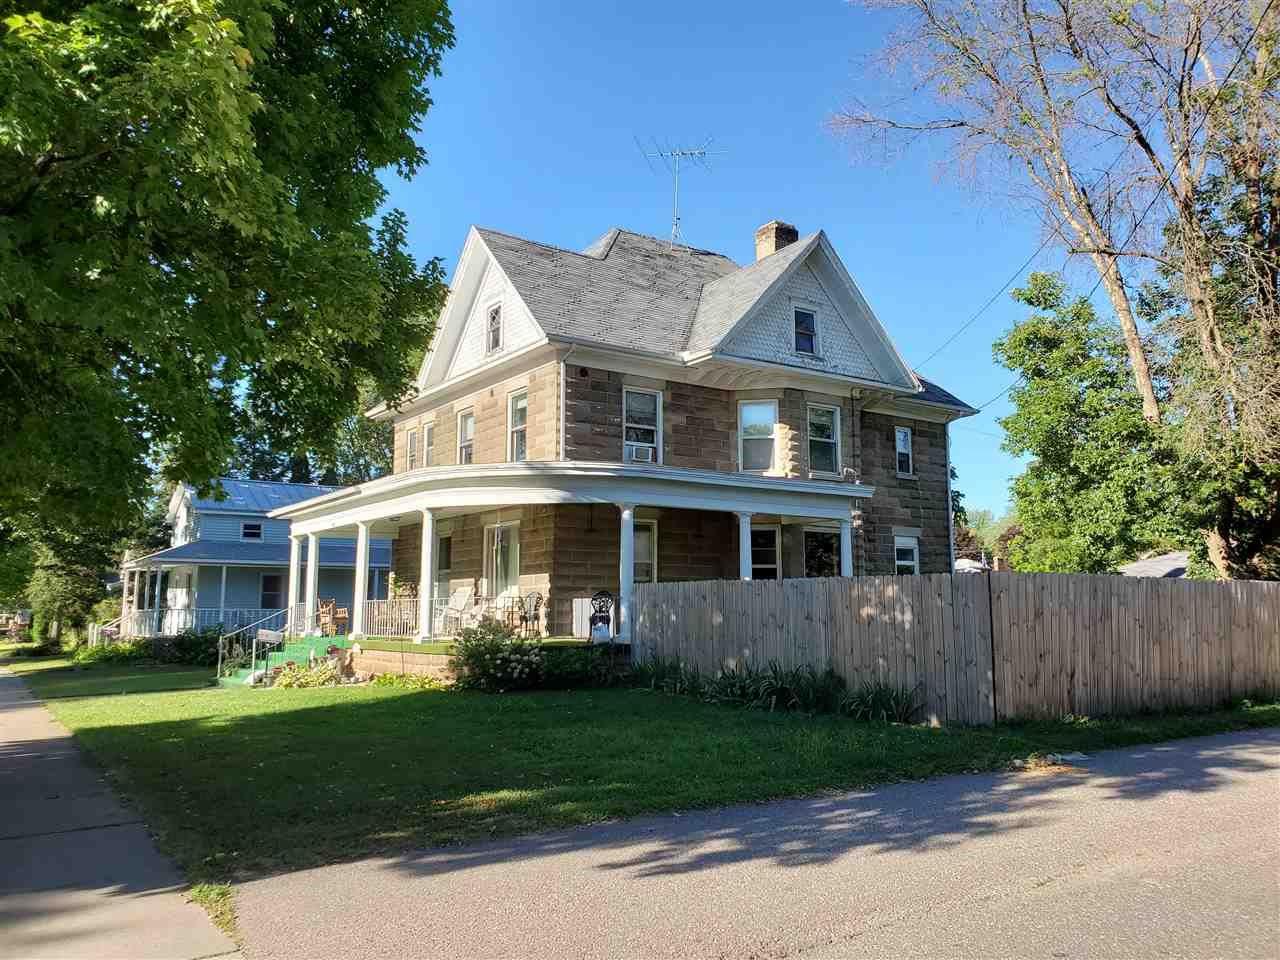 810 Bowman Rd, Wisconsin Dells, WI 53965 - #: 1890696